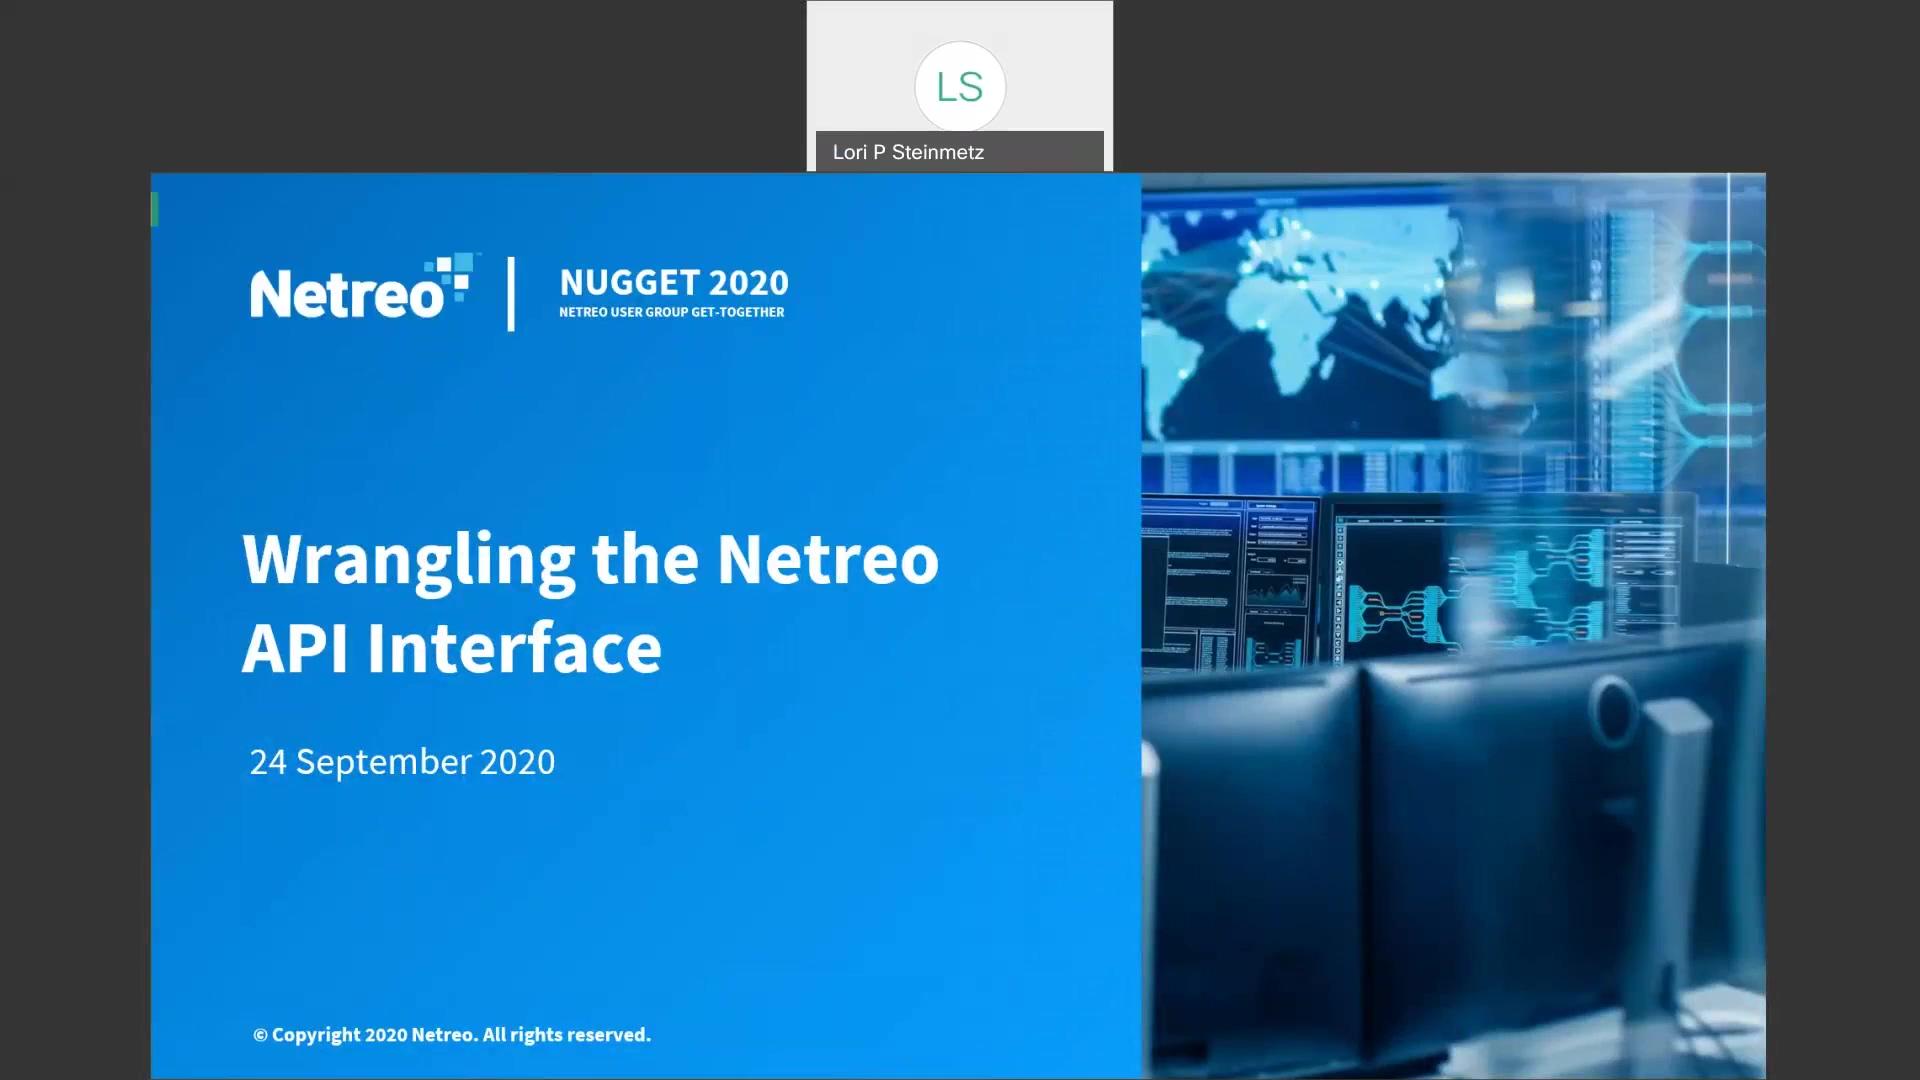 Wrangling the Netreo API Interface